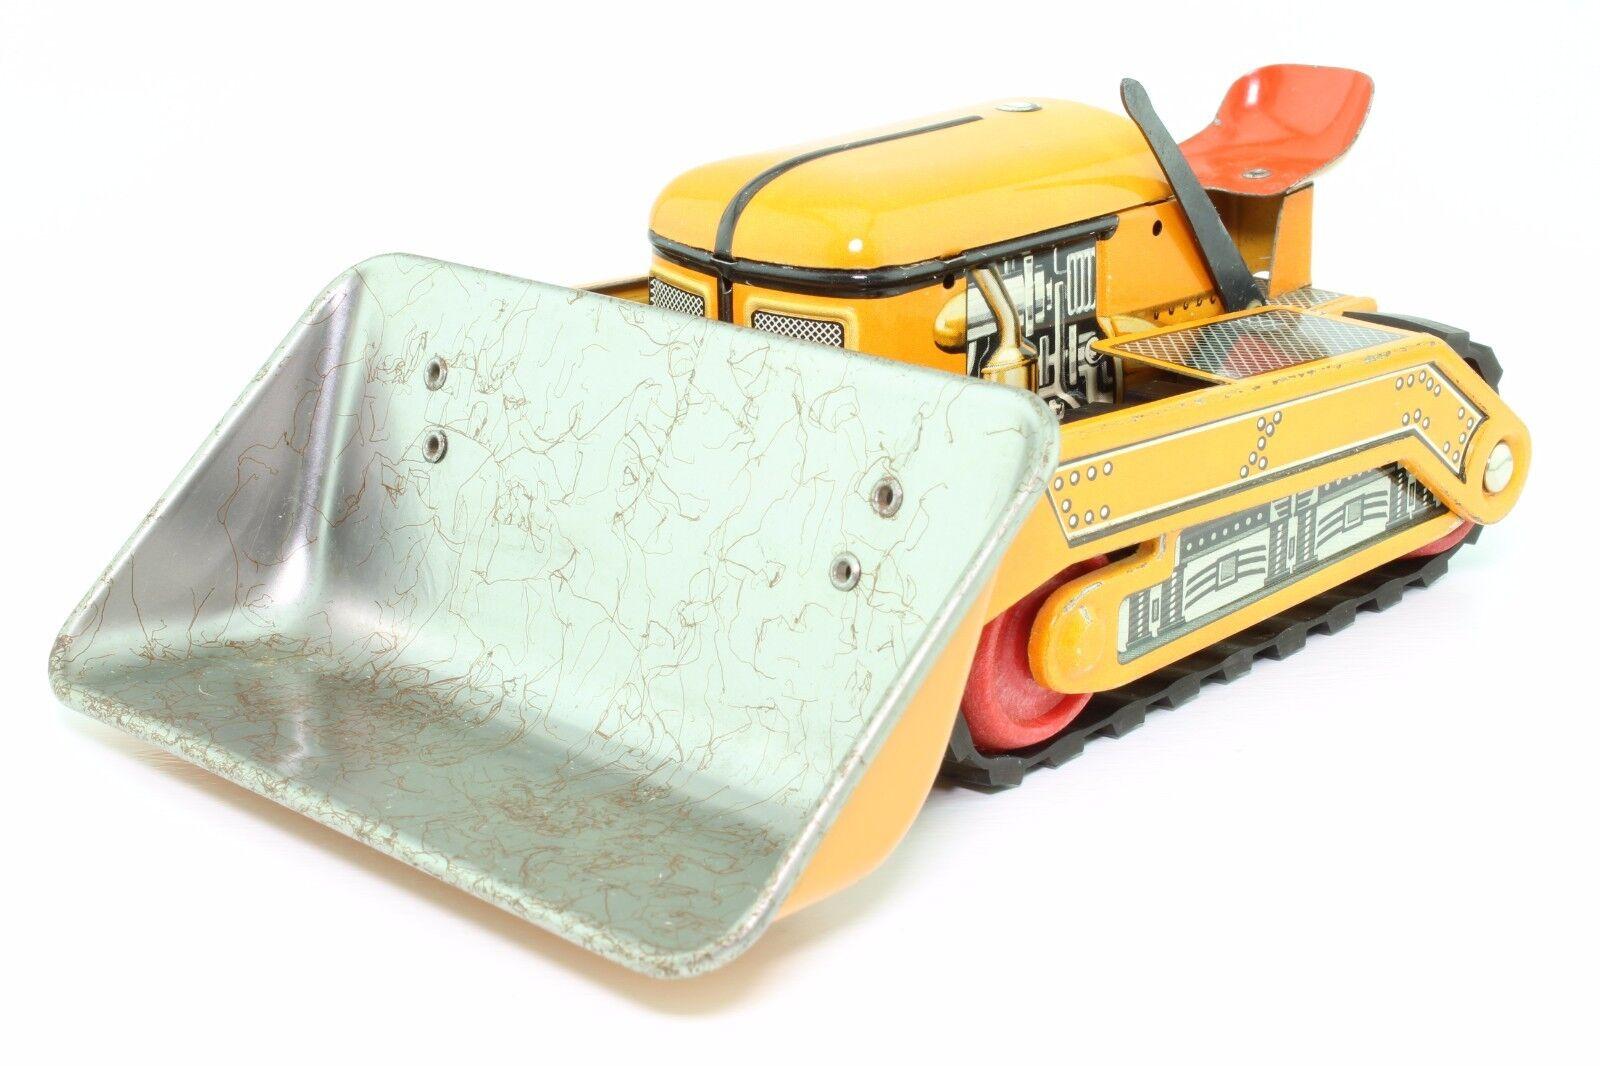 blechspielzeug tippco tco 65 planierraupe bulldozer tip top nutzfahrzeuge original. Black Bedroom Furniture Sets. Home Design Ideas